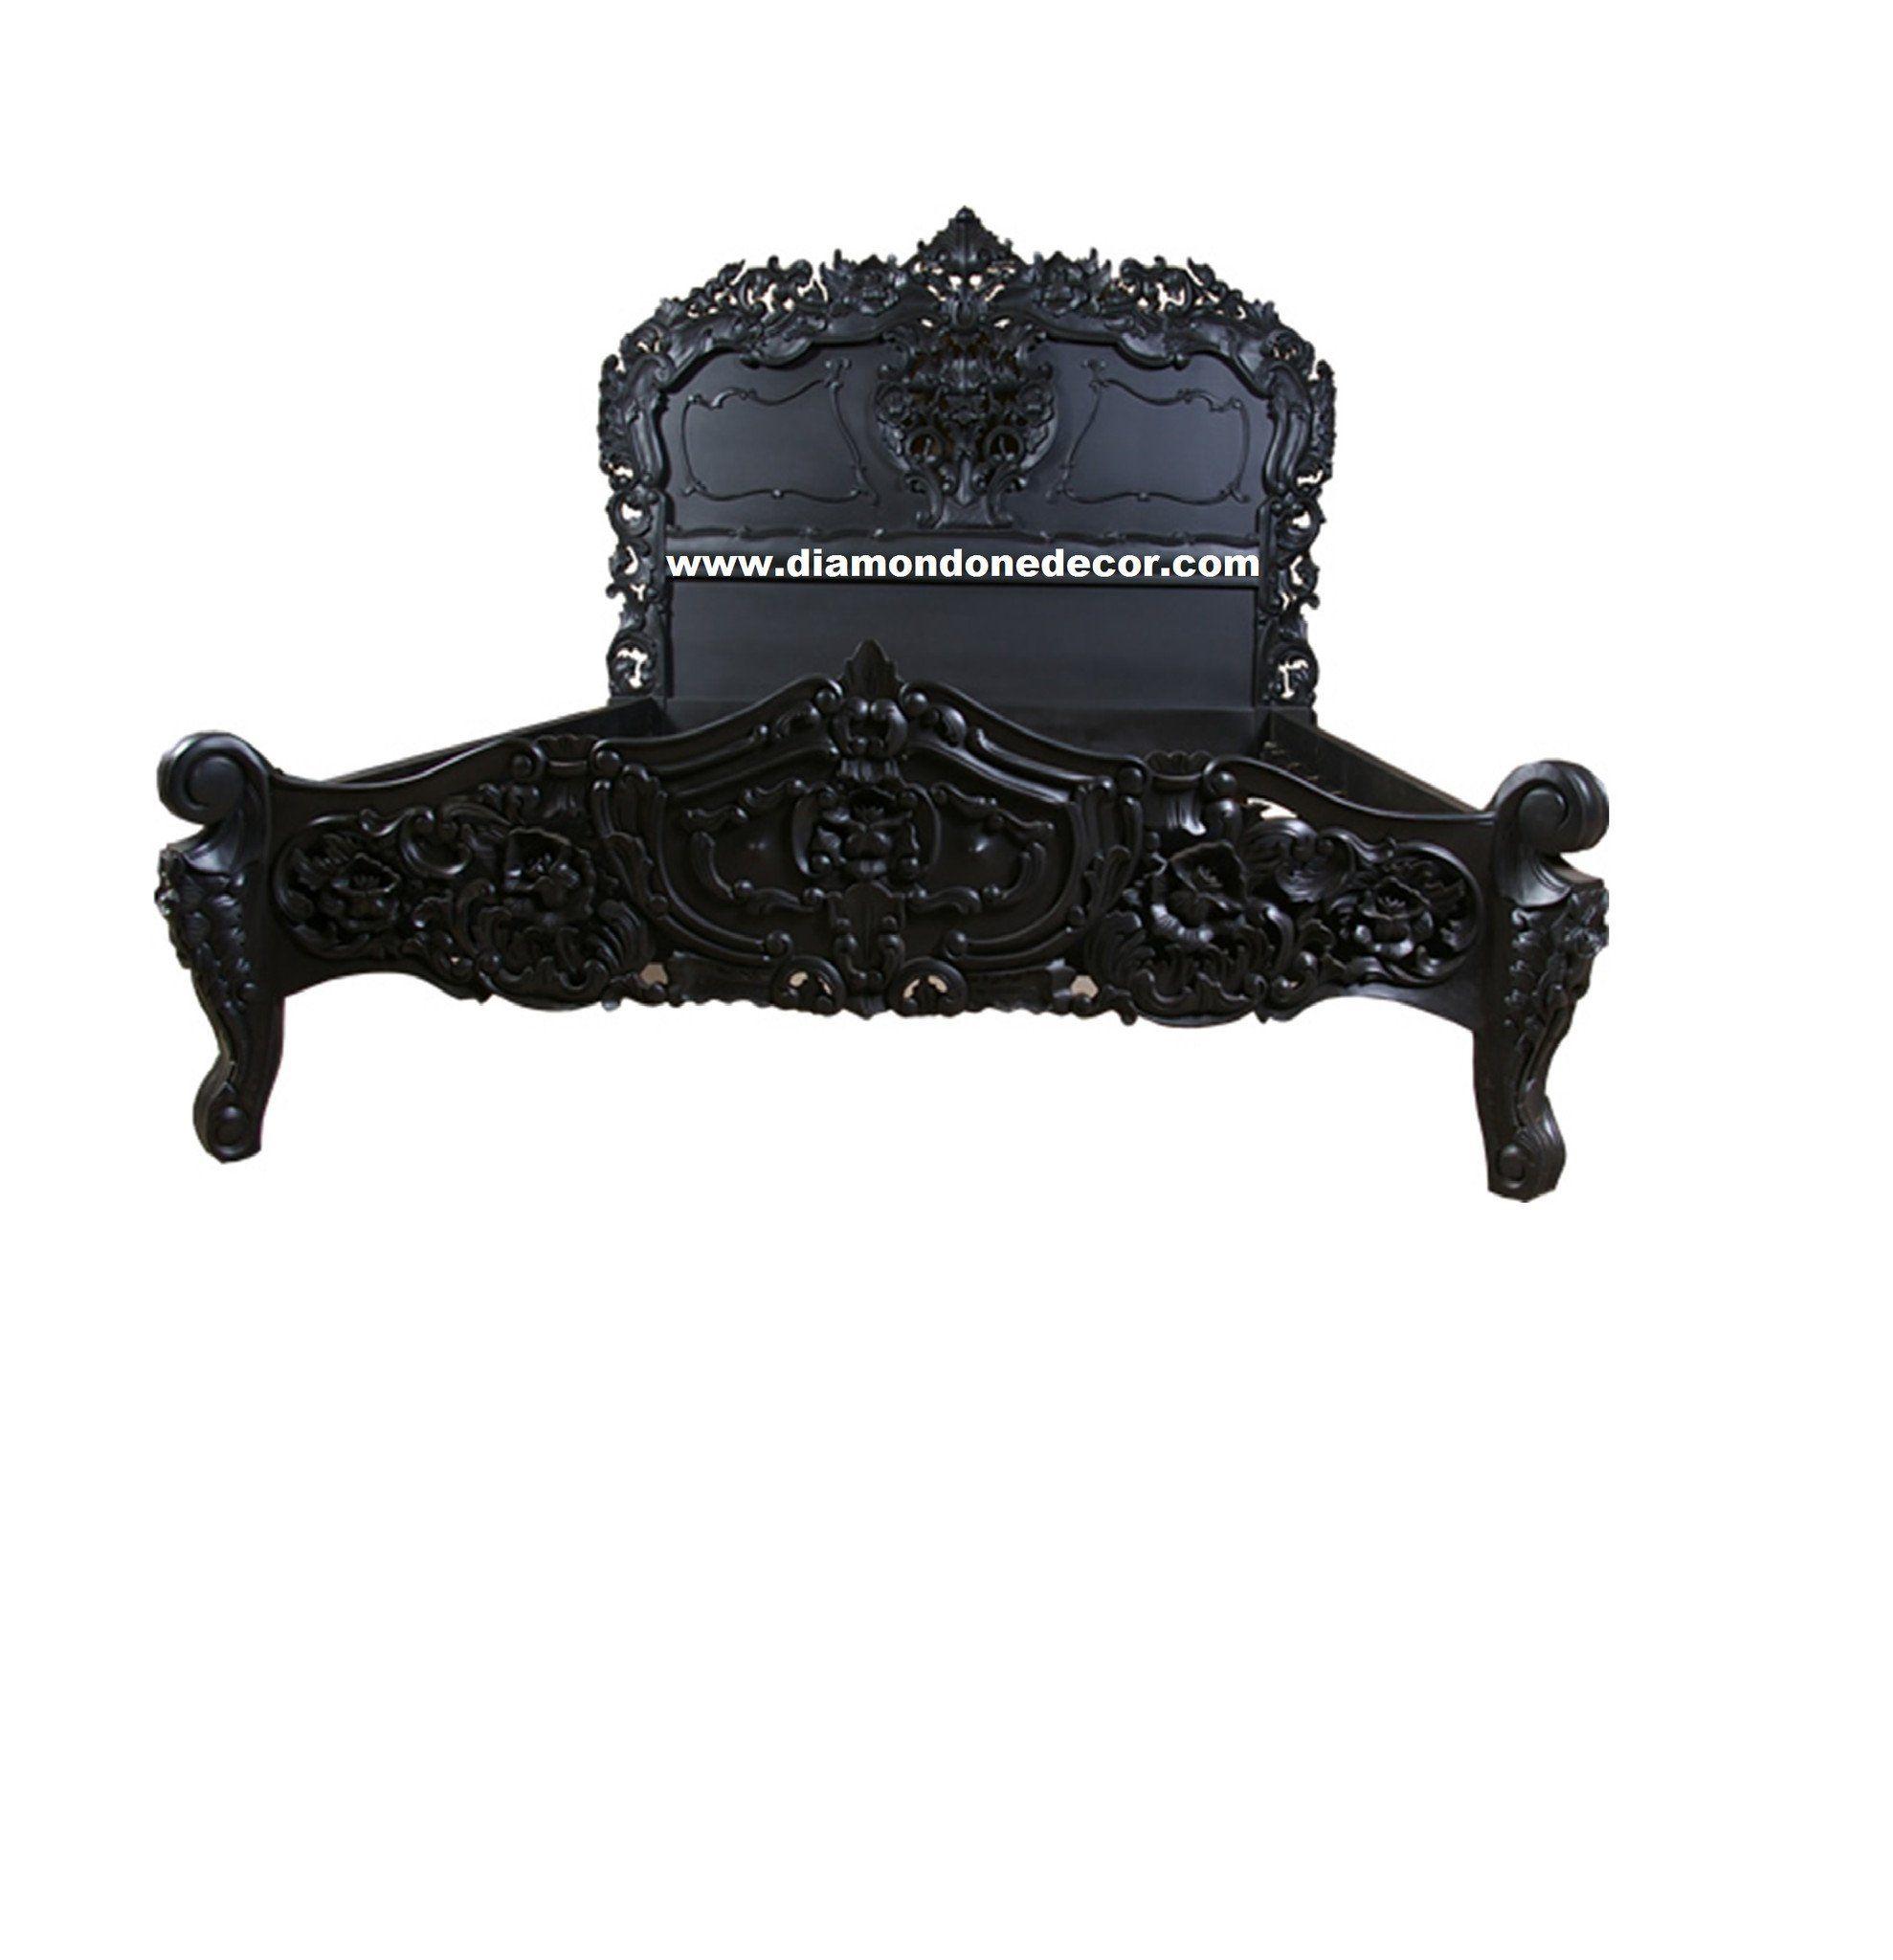 Dreamy Rococo Black French Reproduction Baroque Louis XVI